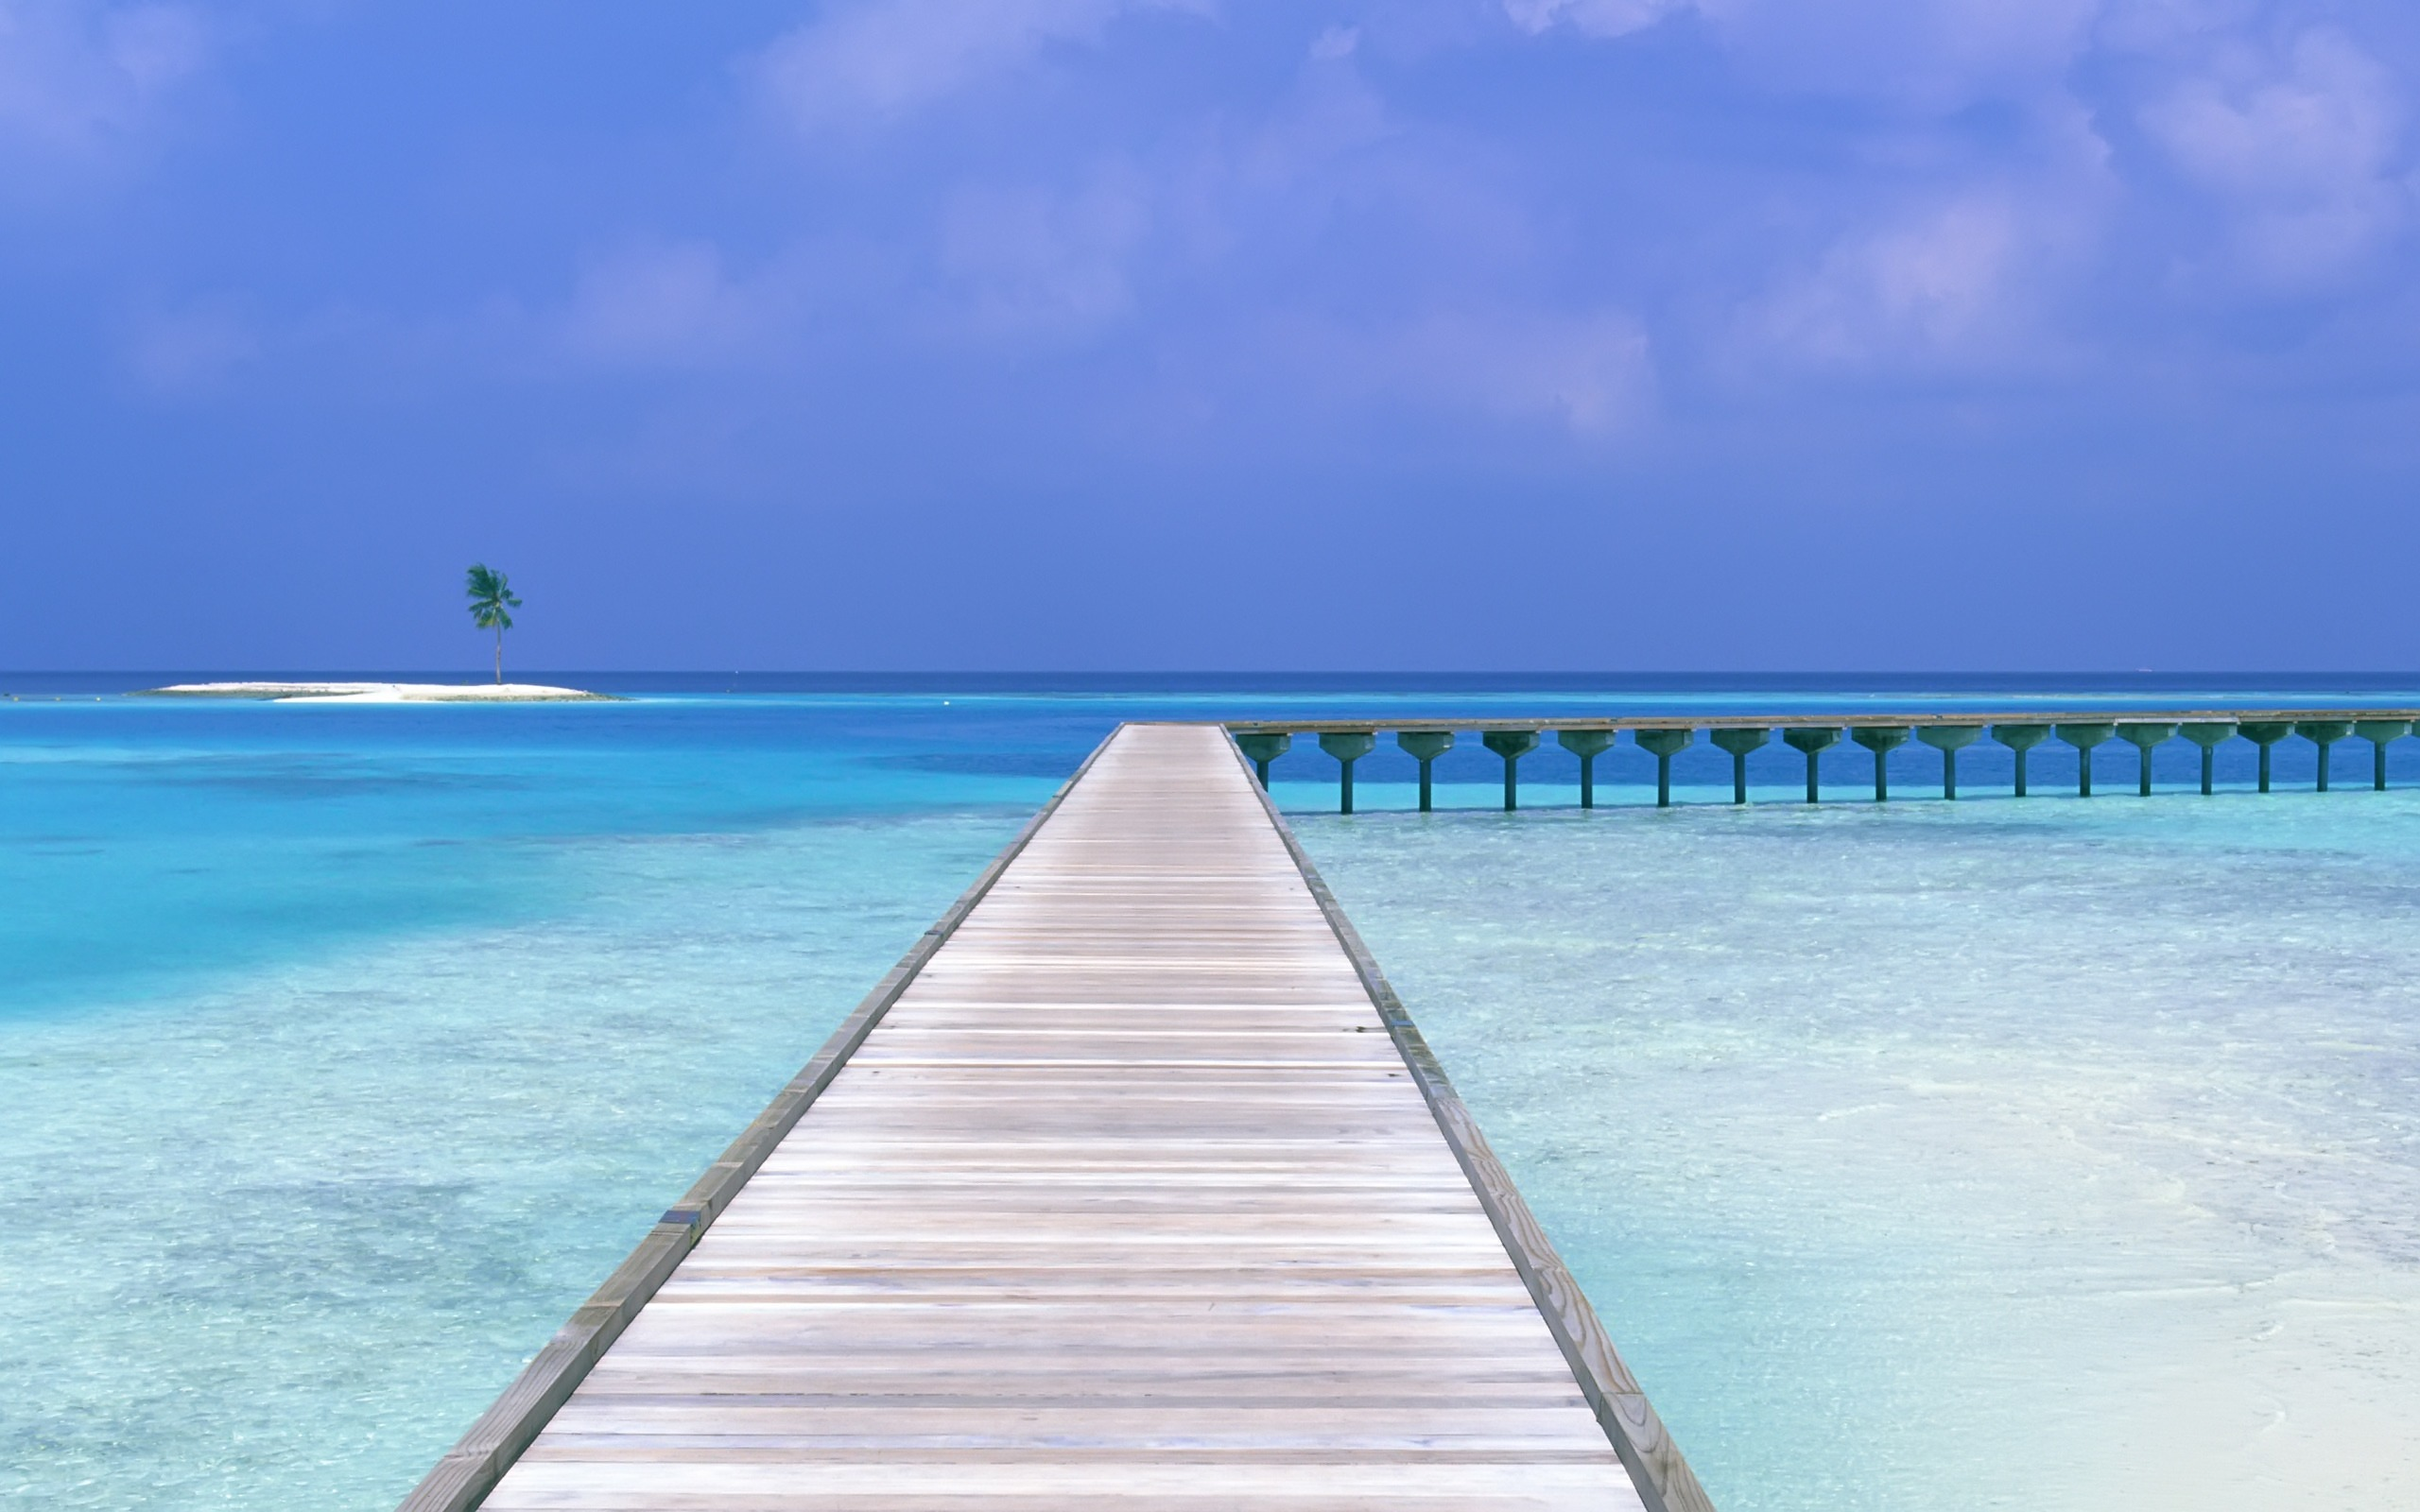 2560x1600 Maldives Dock Wallpaper Maldives World wallpaper